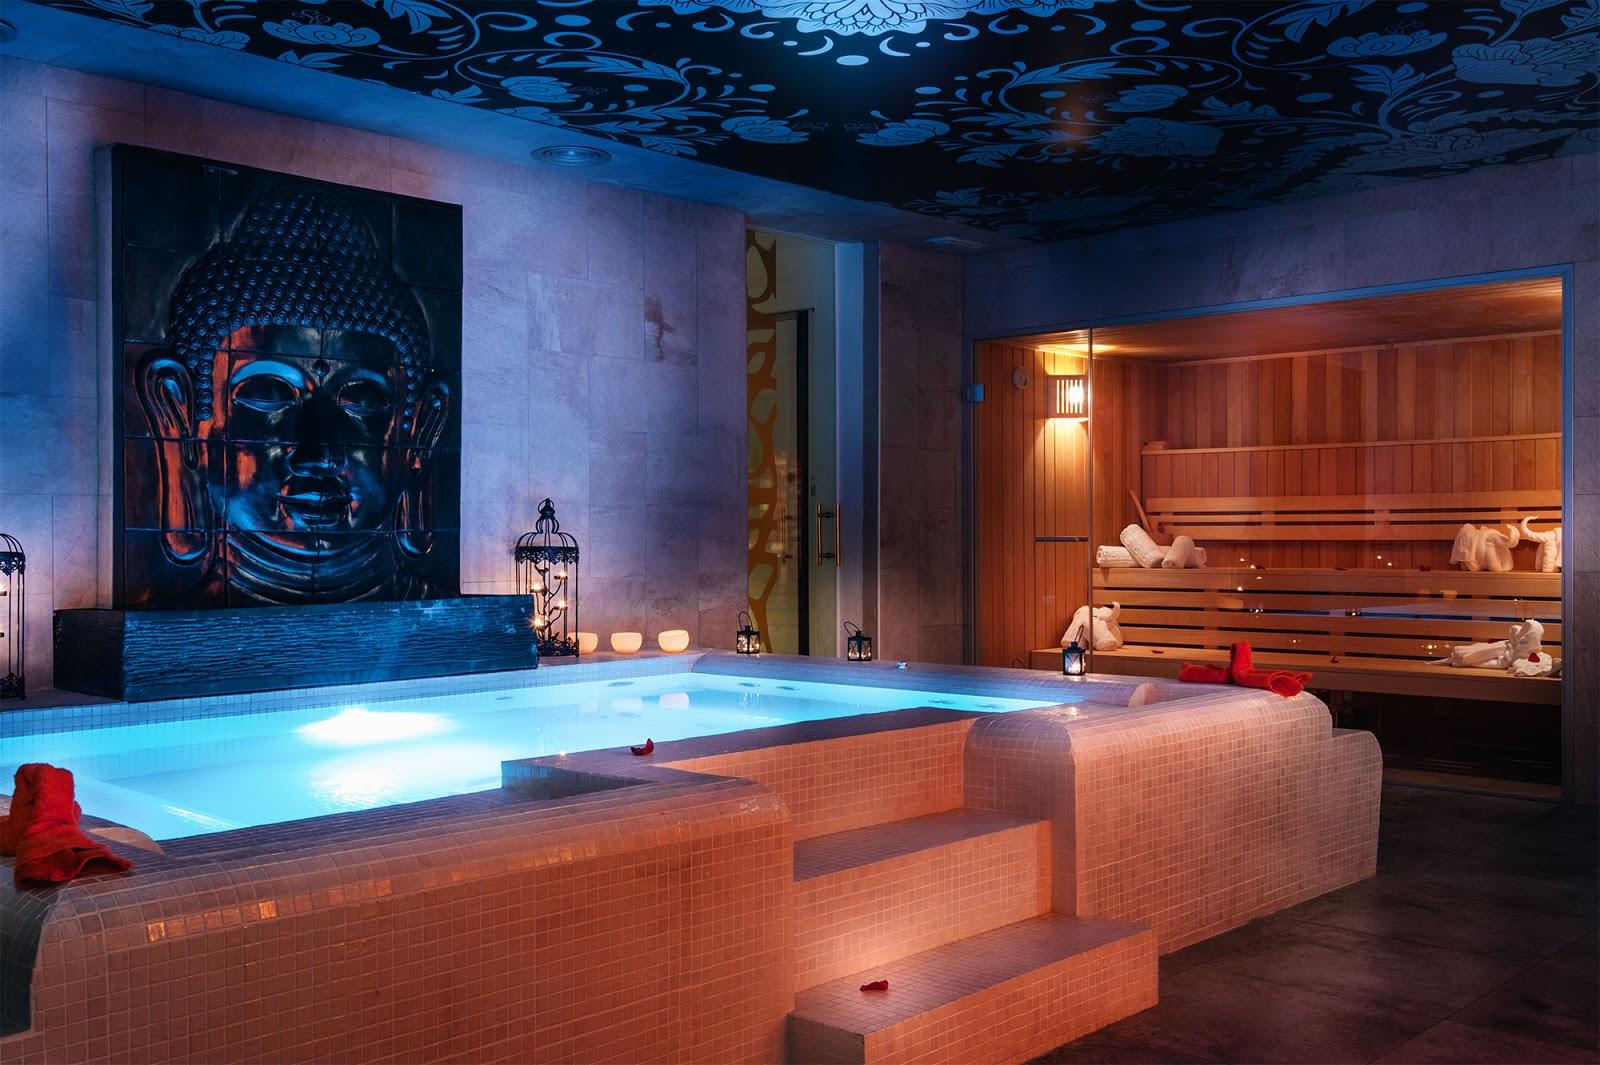 Inexperta 3 spa favoritos en barcelona - Spa aguas de barcelona ...